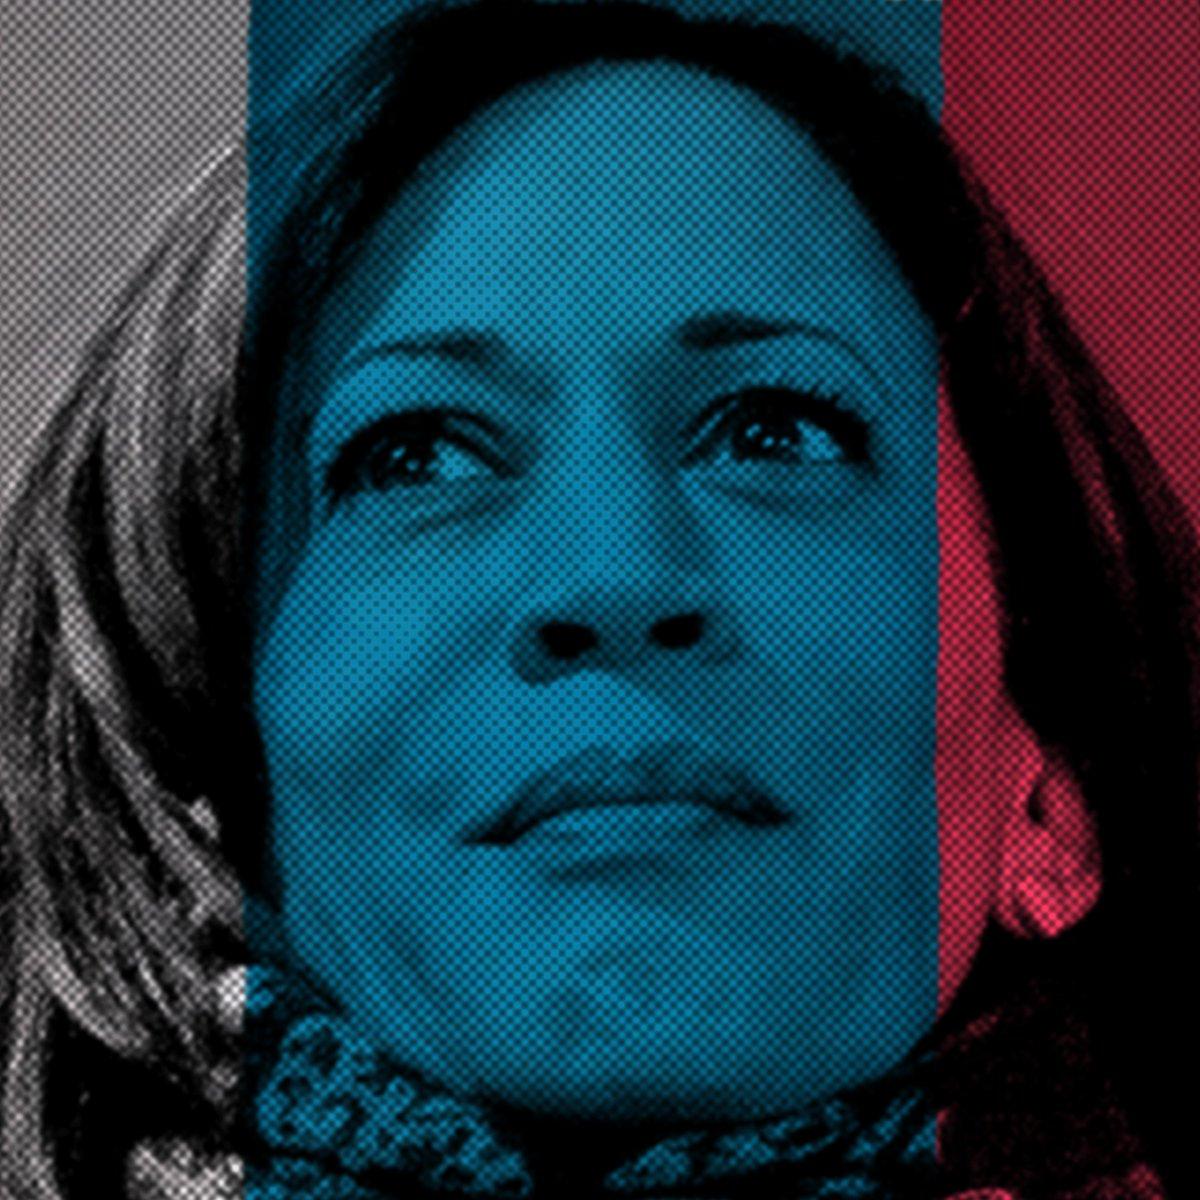 @MichelleObama #KamalaHarrisVicePresidentElect